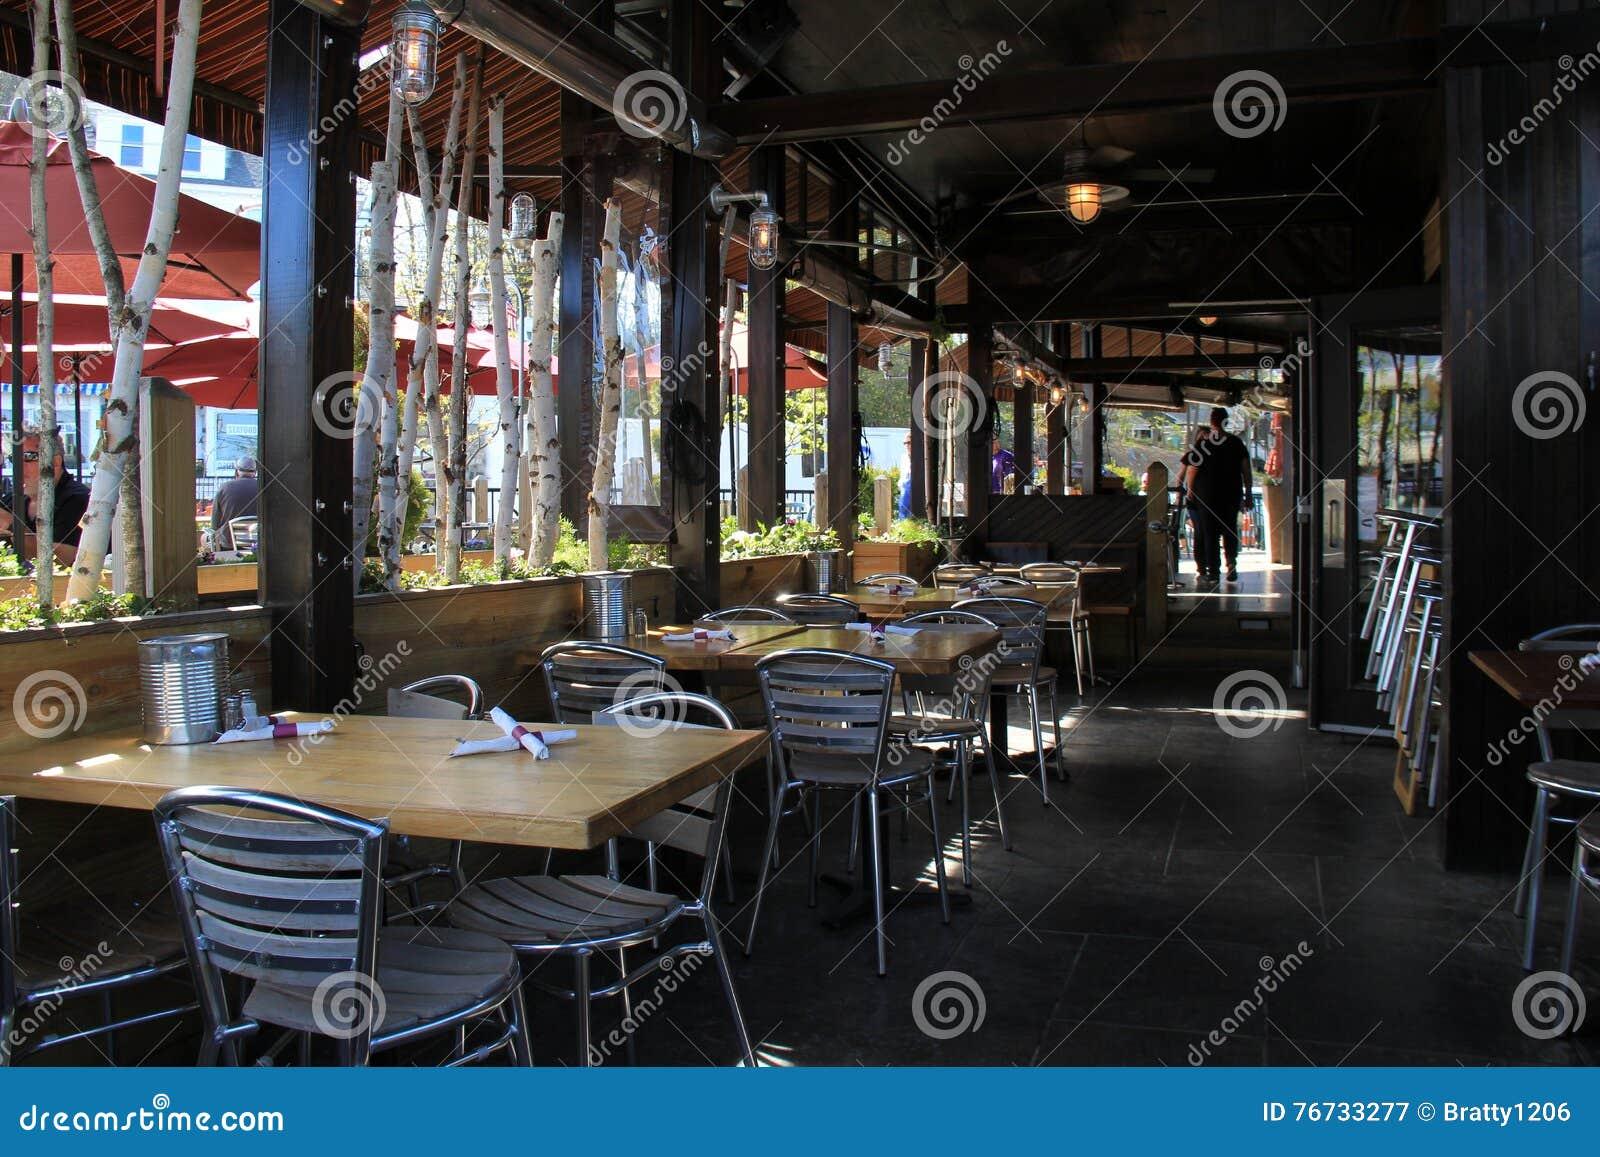 Three Season Porch Seating At Cornerstone Artisanal Pizza And Craft